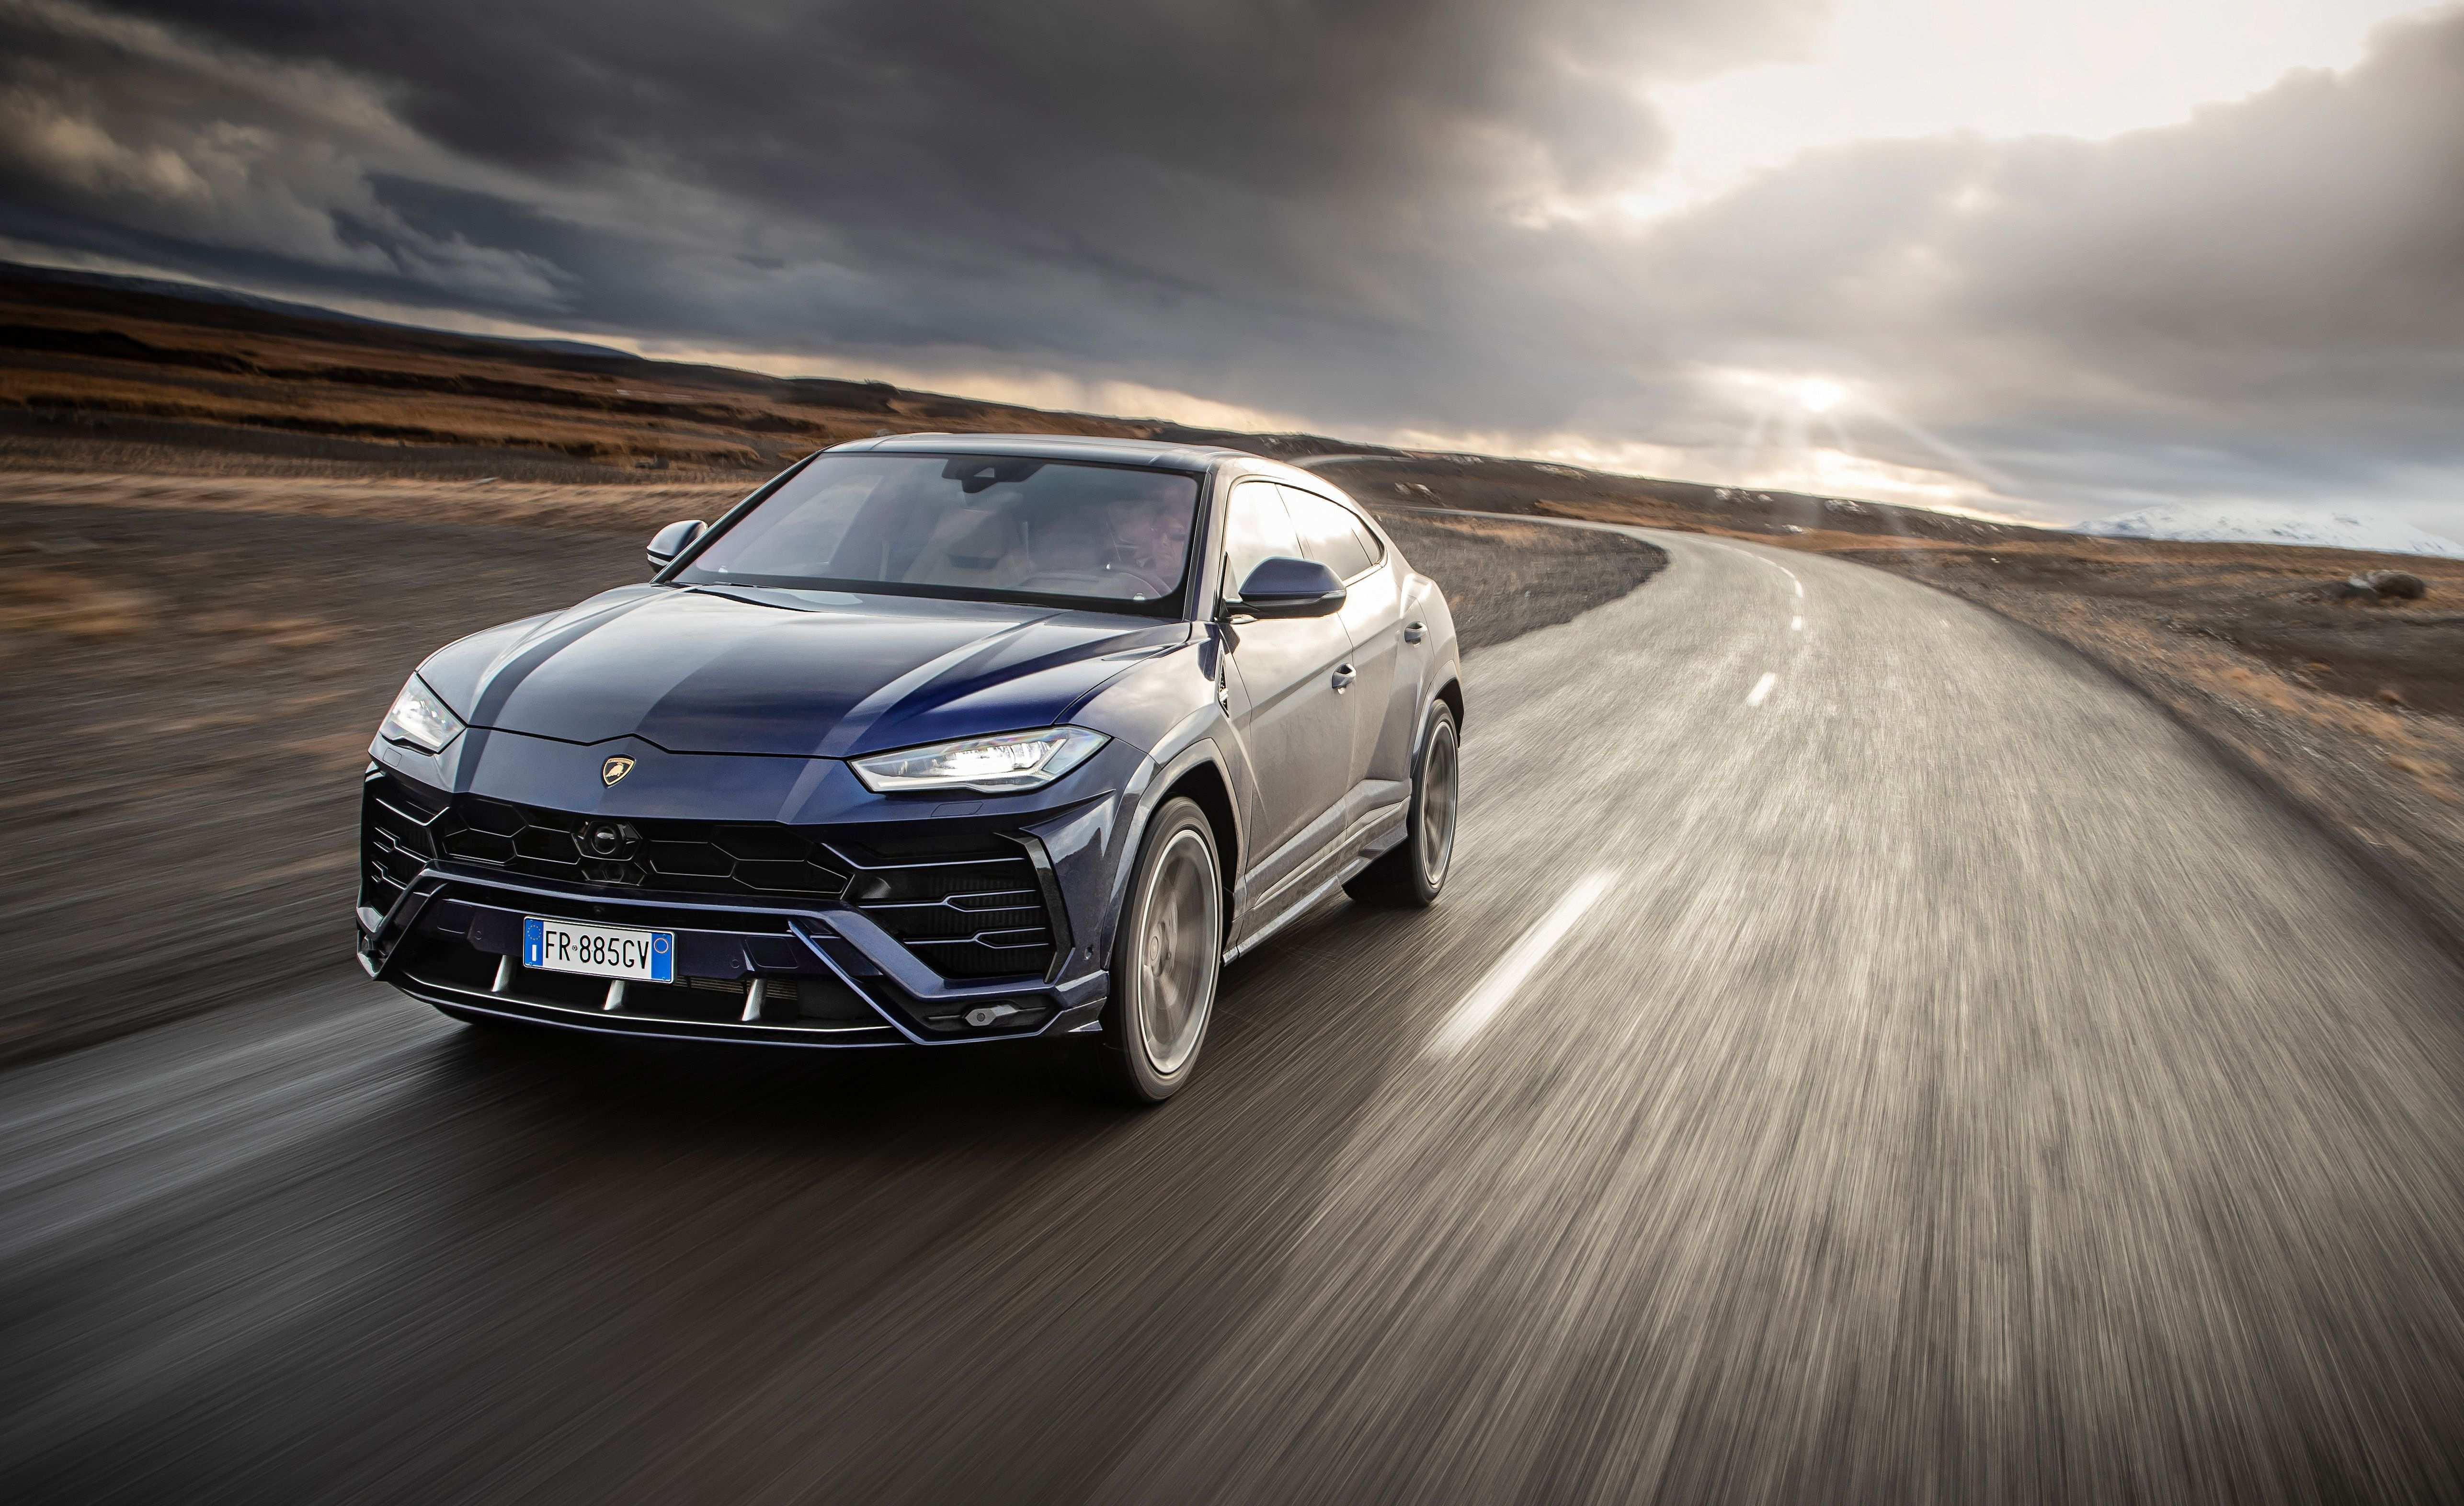 91 Best Review 2019 Lamborghini Urus Review History with 2019 Lamborghini Urus Review